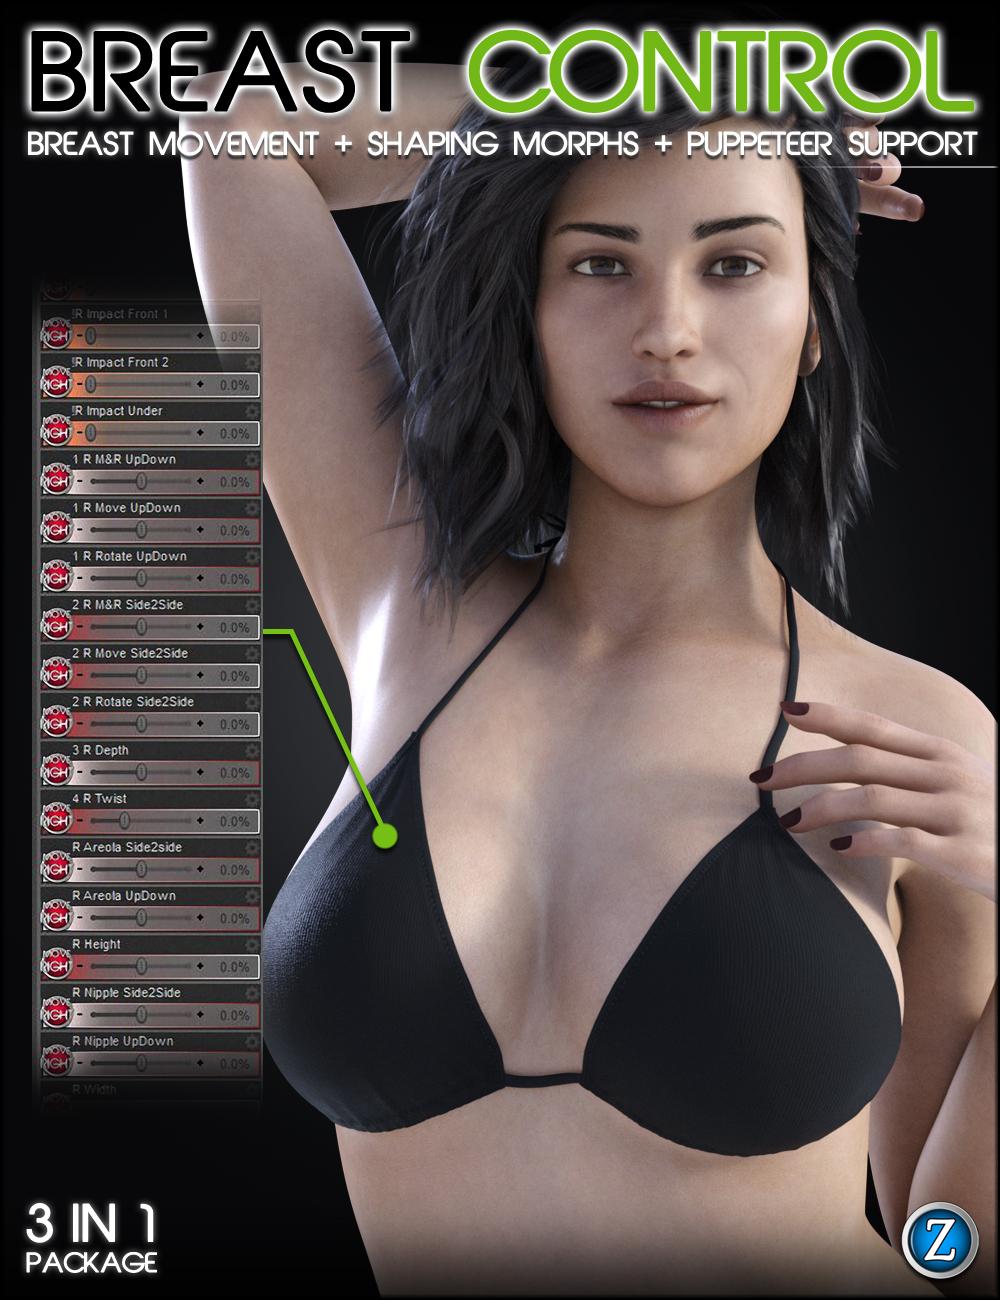 Breast Control Genesis 8 Female(s) by: Zev0, 3D Models by Daz 3D